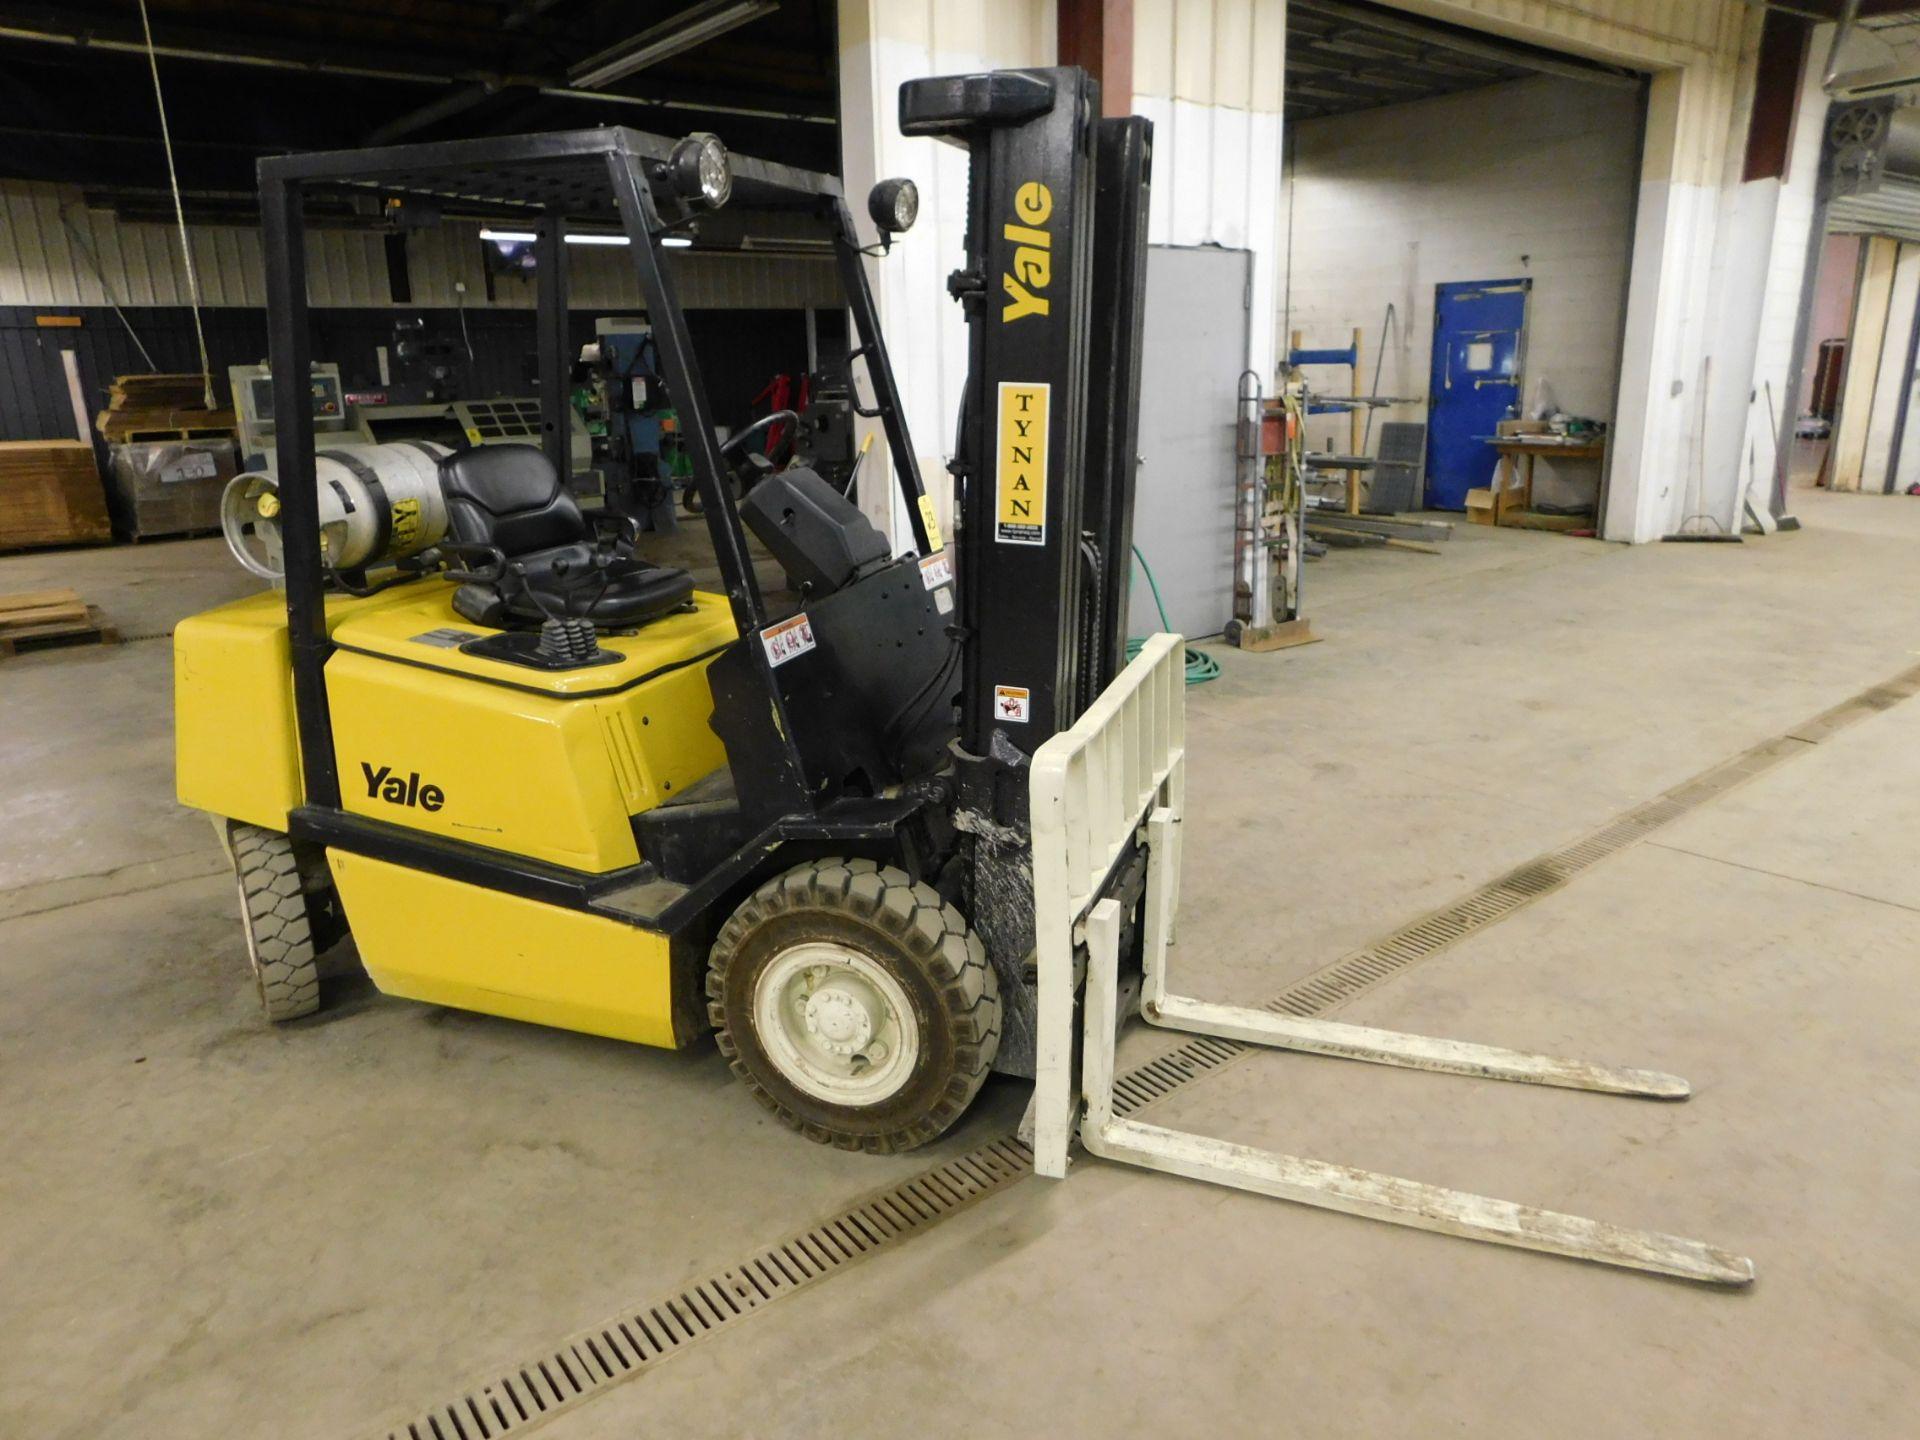 Lot 23 - Yale Model GTP050JFNUAE086 Forklift, SN E177B18357U, 4,700 lb. Cap. LP, Solid Pneumatic Tires, 3-